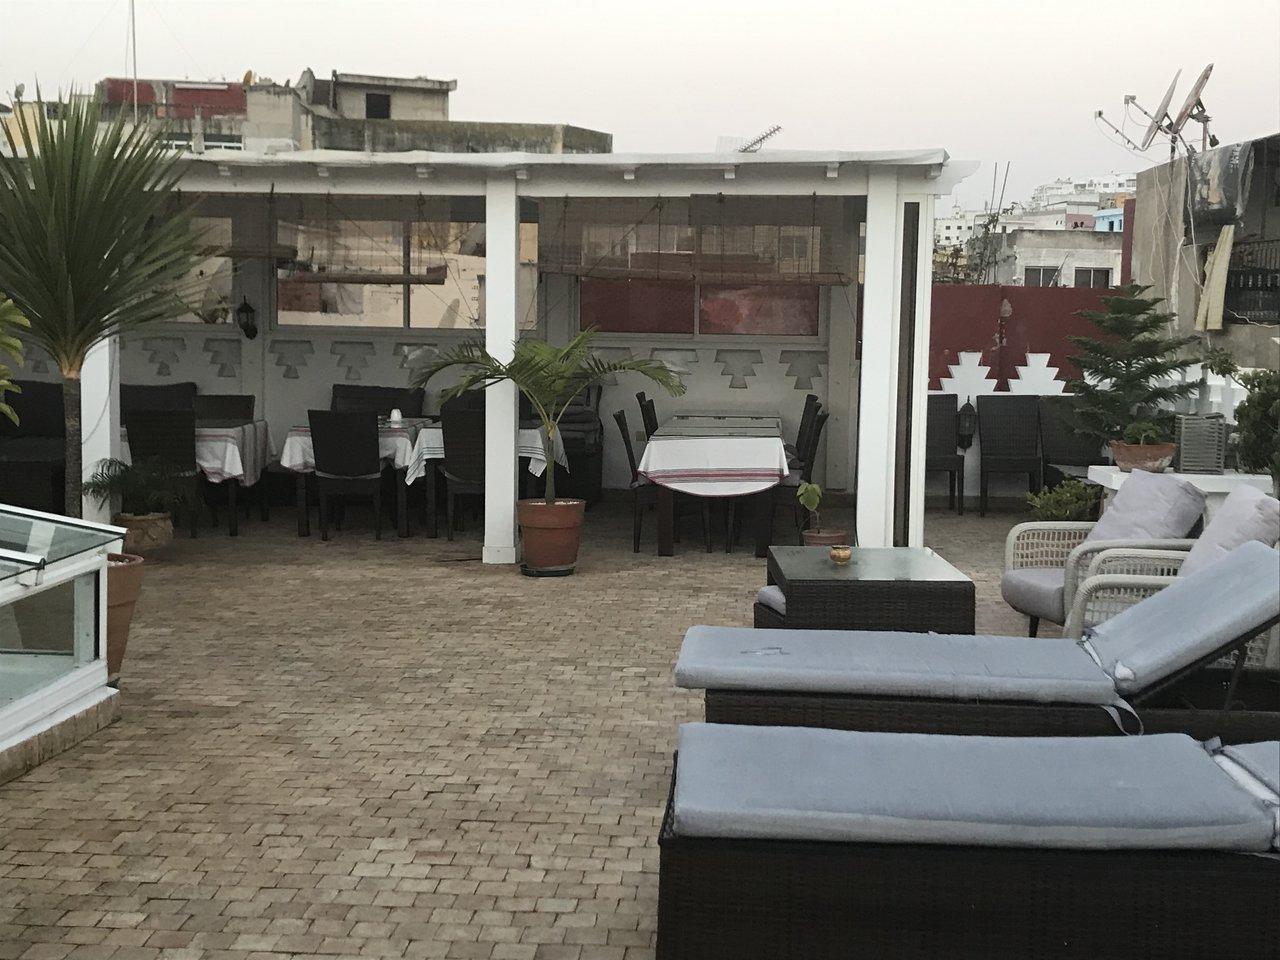 Car Souran terrace. Breakfast on the last day. | Photo taken by Chris M